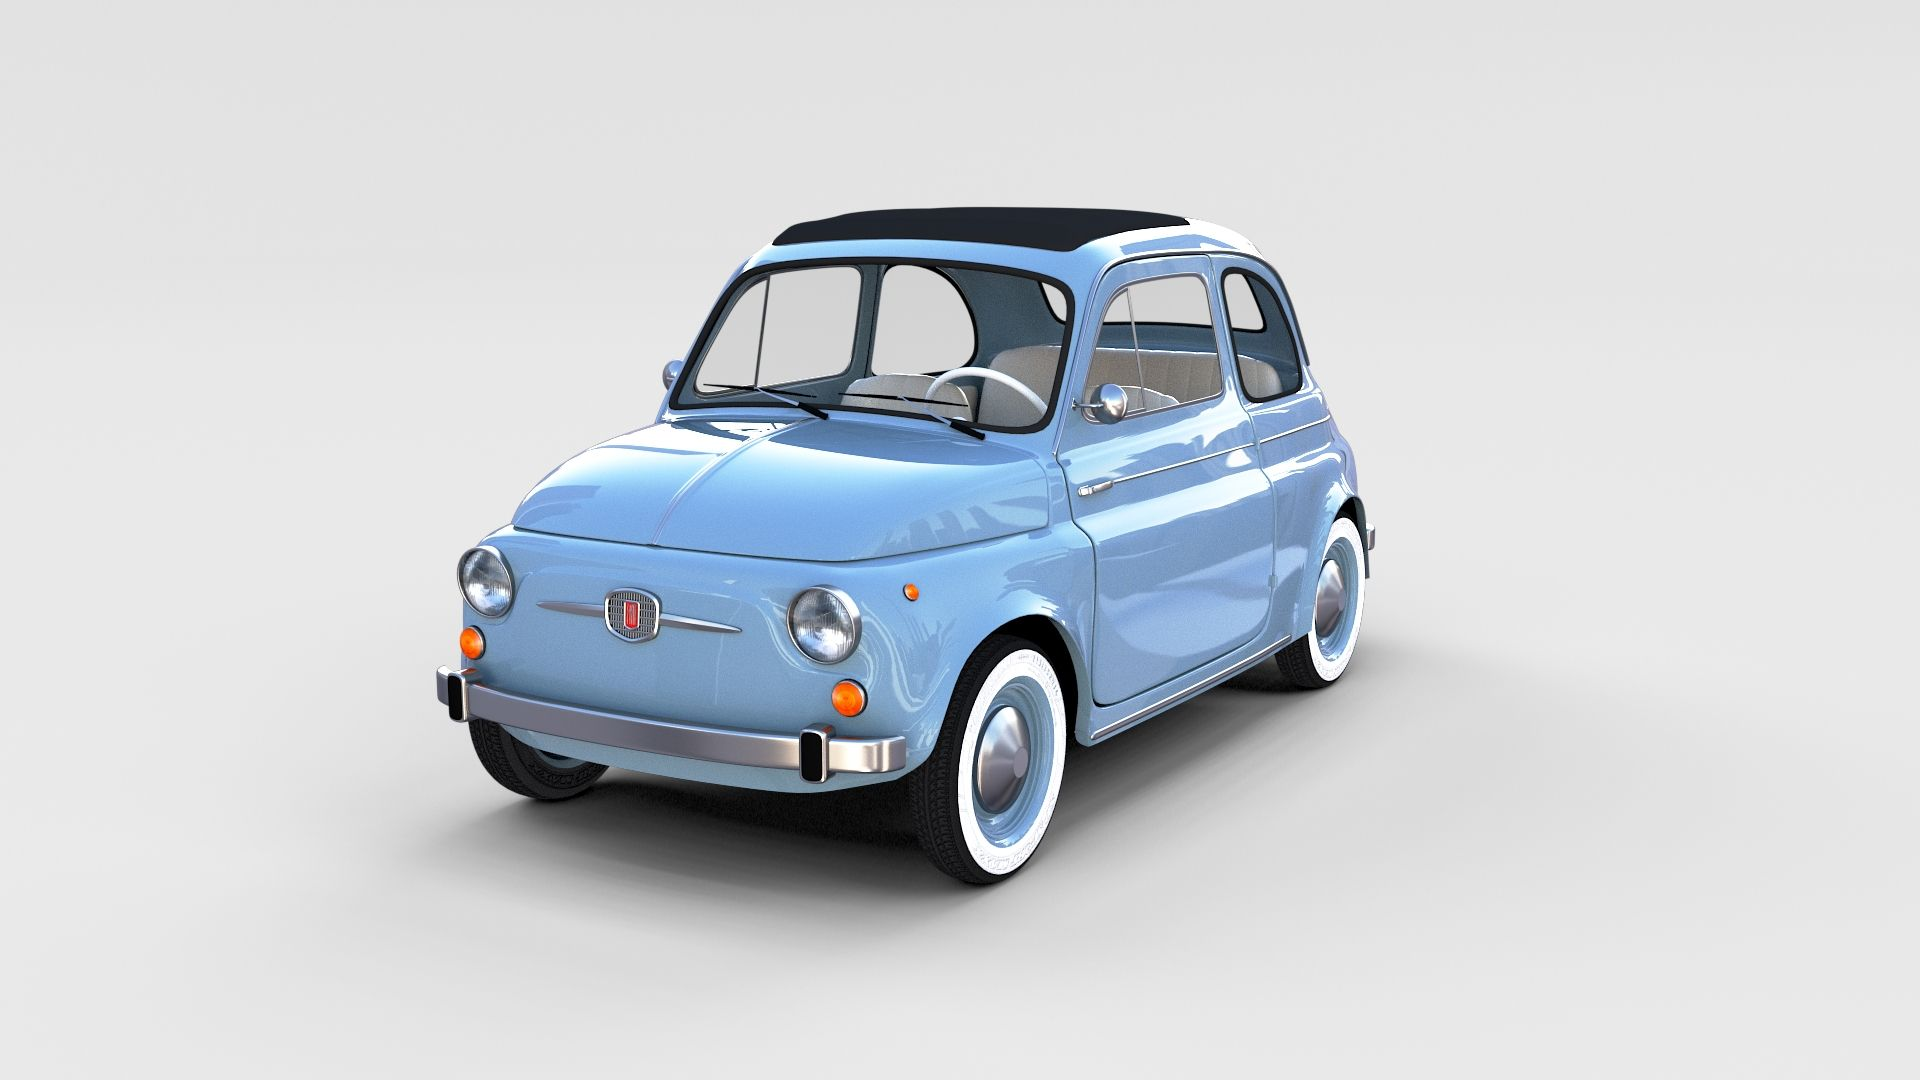 Fiat Nuova 500 1957 Rev Fiat 500 Fiat Mini Cooper